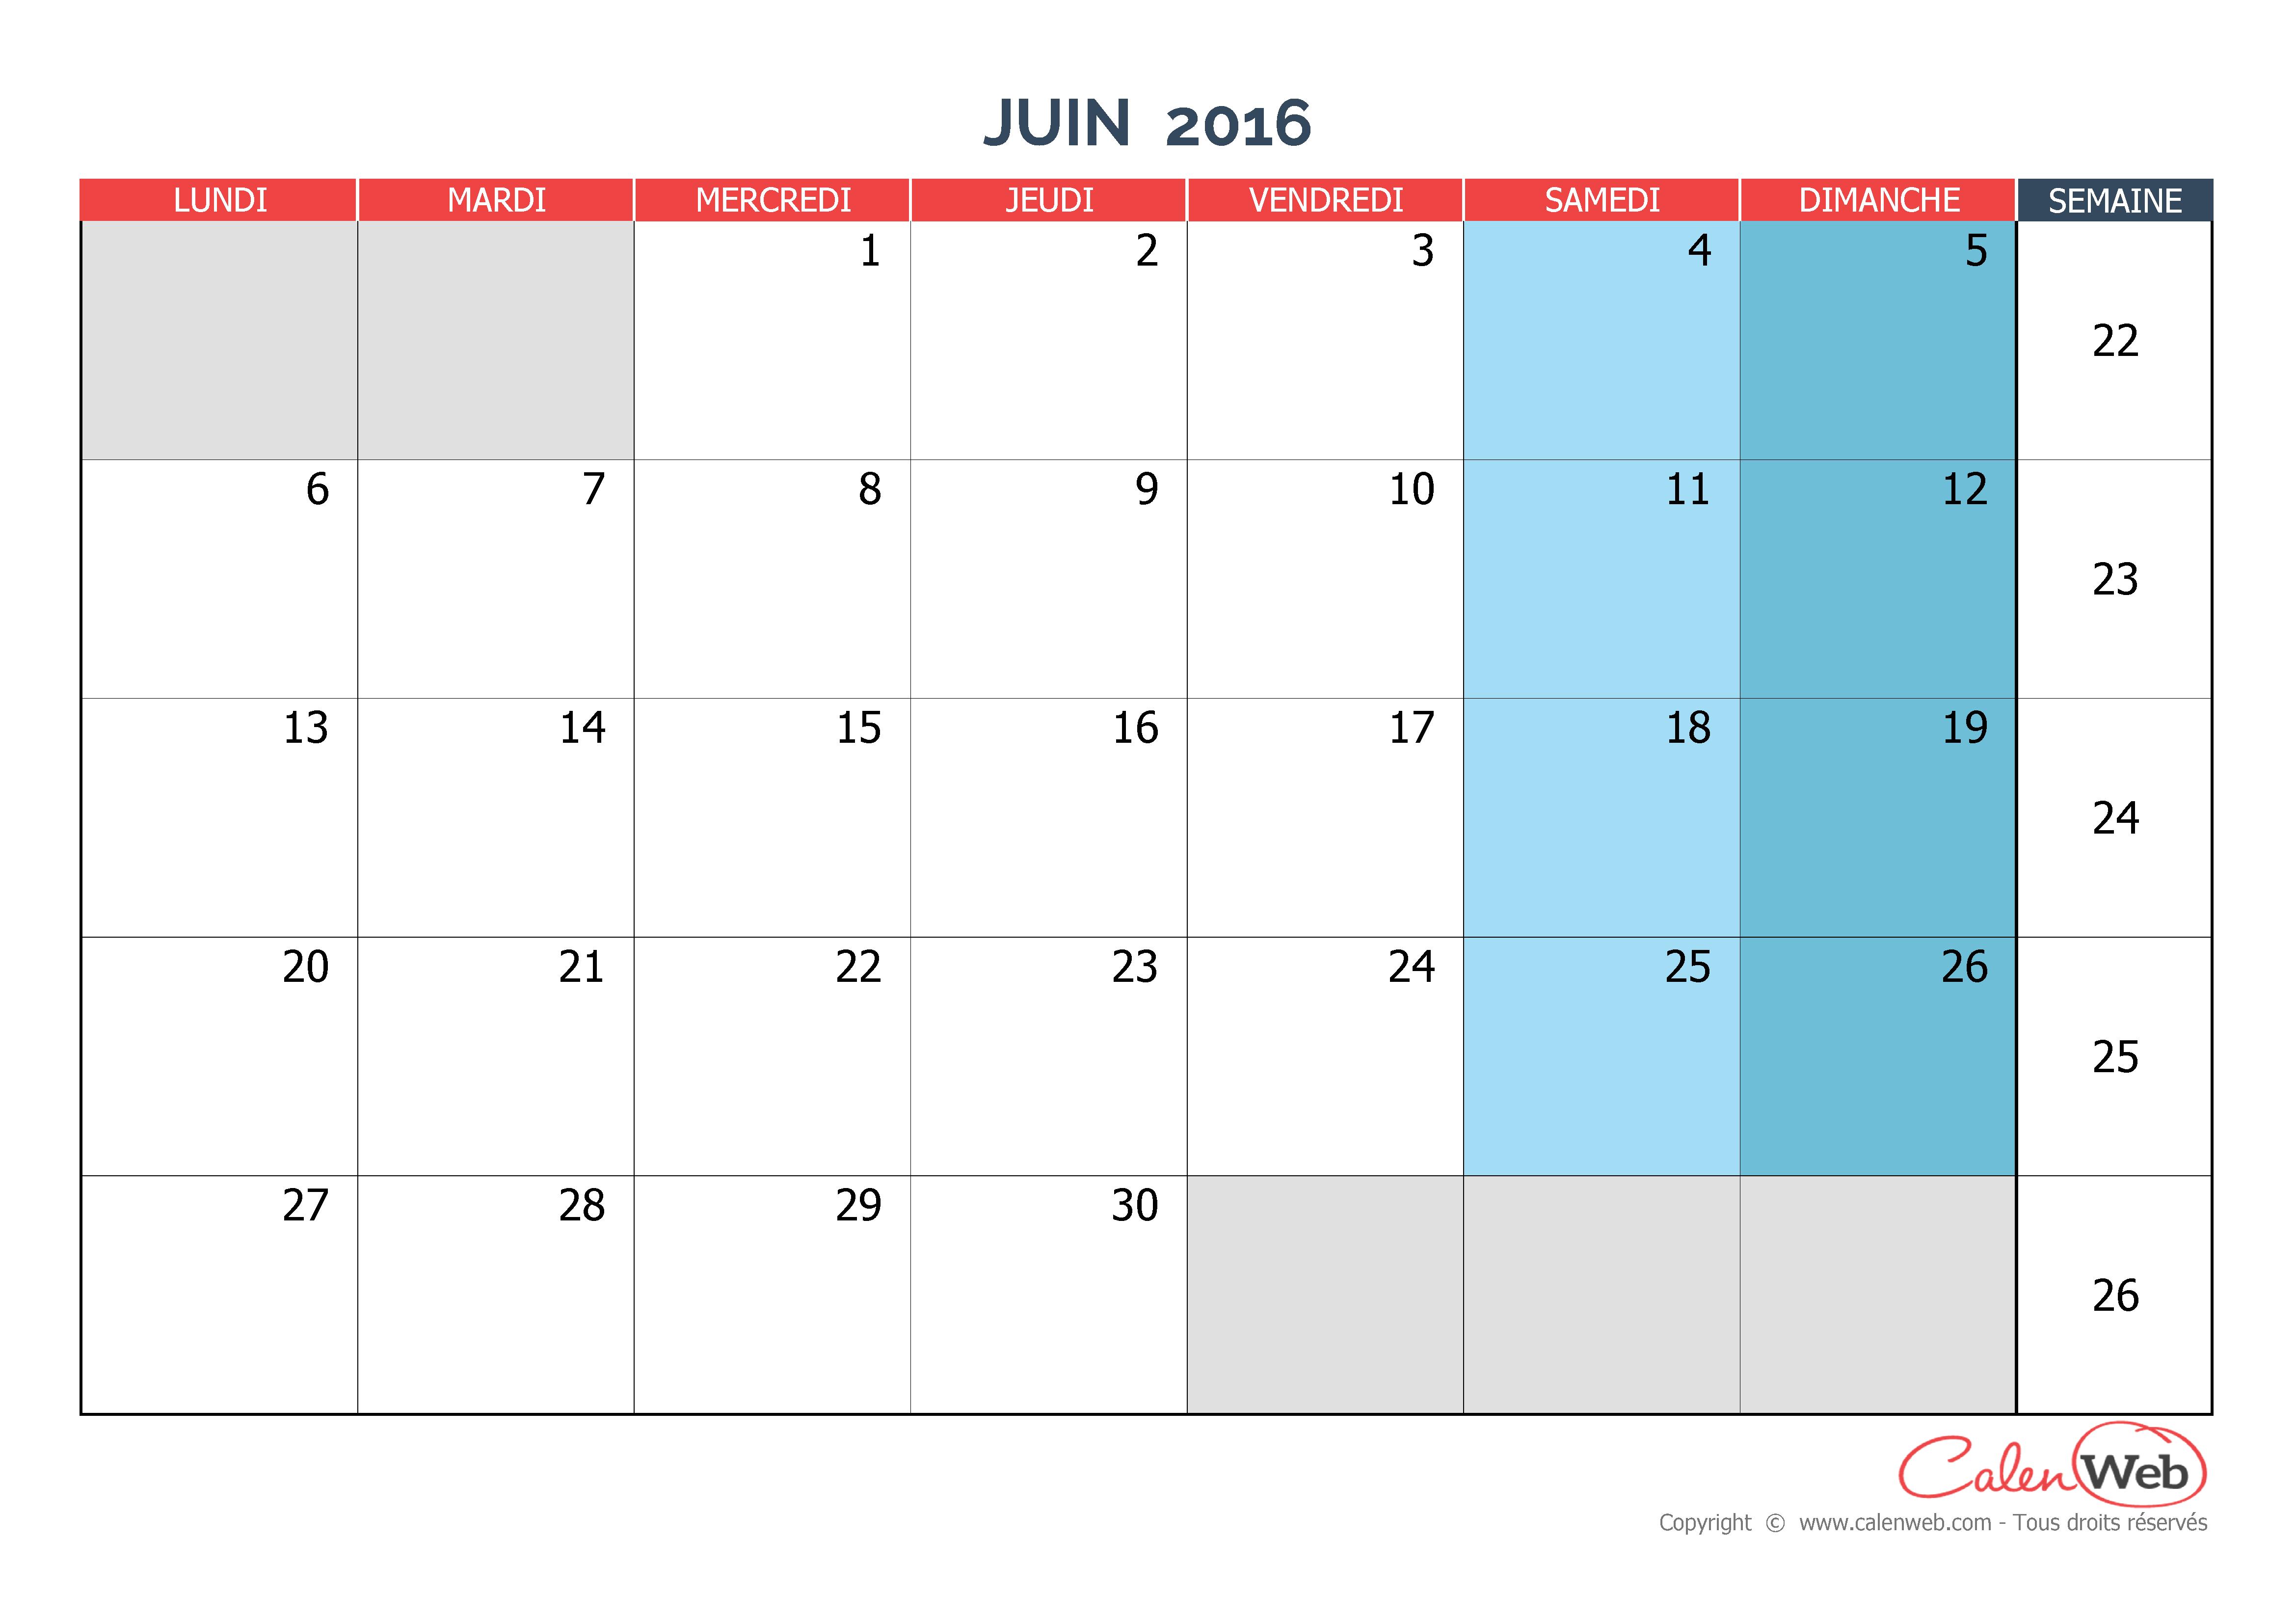 Calendrier mensuel - Mois de juin 2016 Version vierge - Calenweb.com